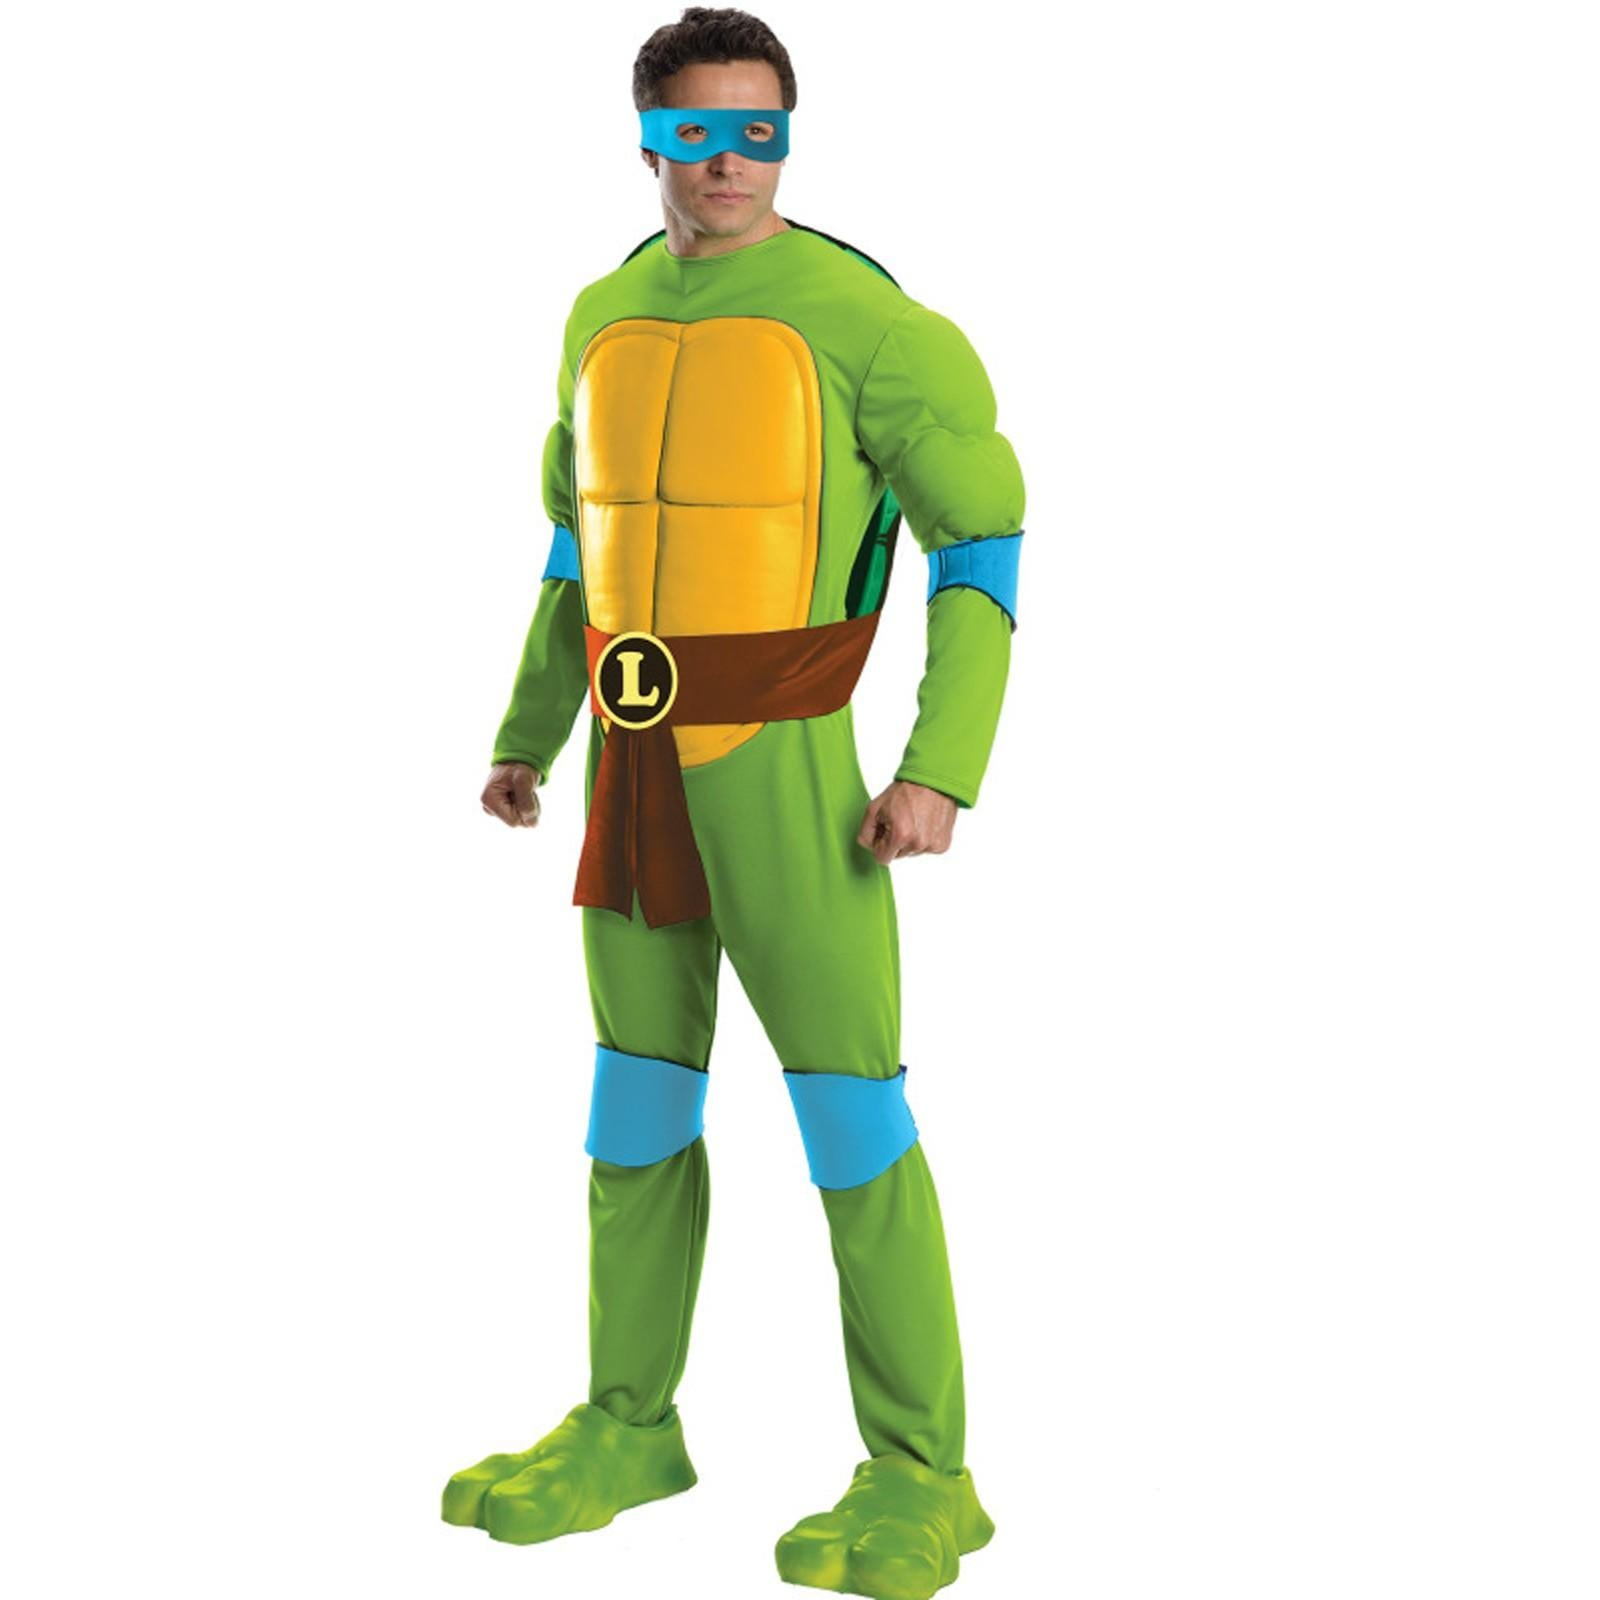 Adult costume pirate used